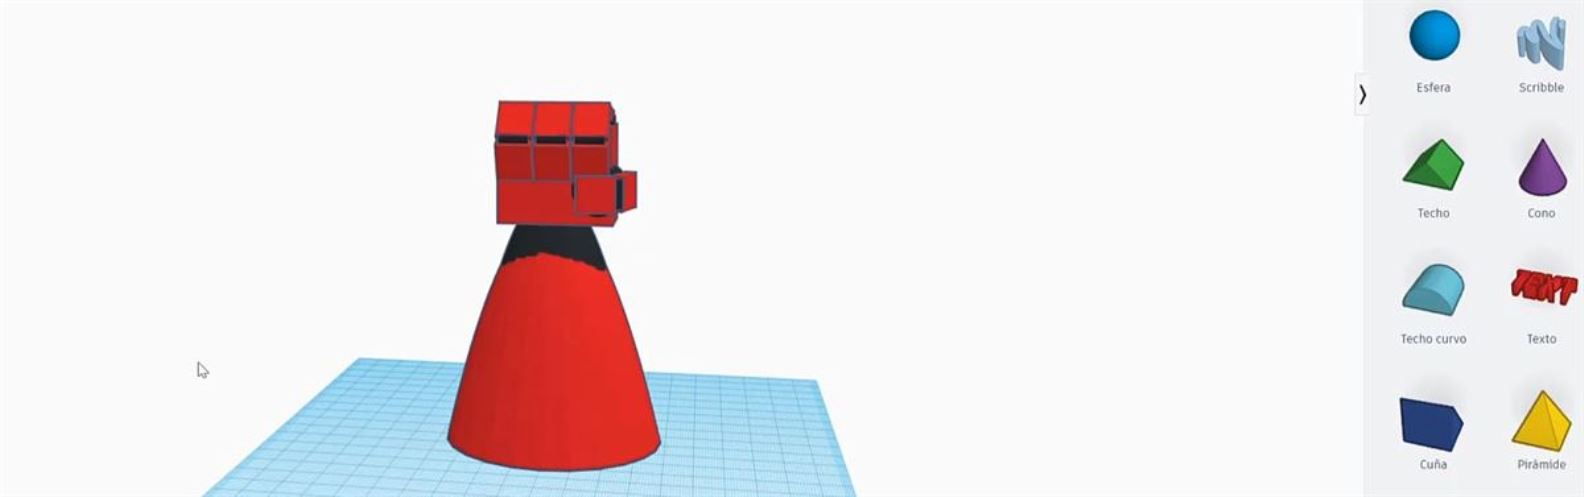 Actividad para niños de Arte 2D/3D: Puño 3D